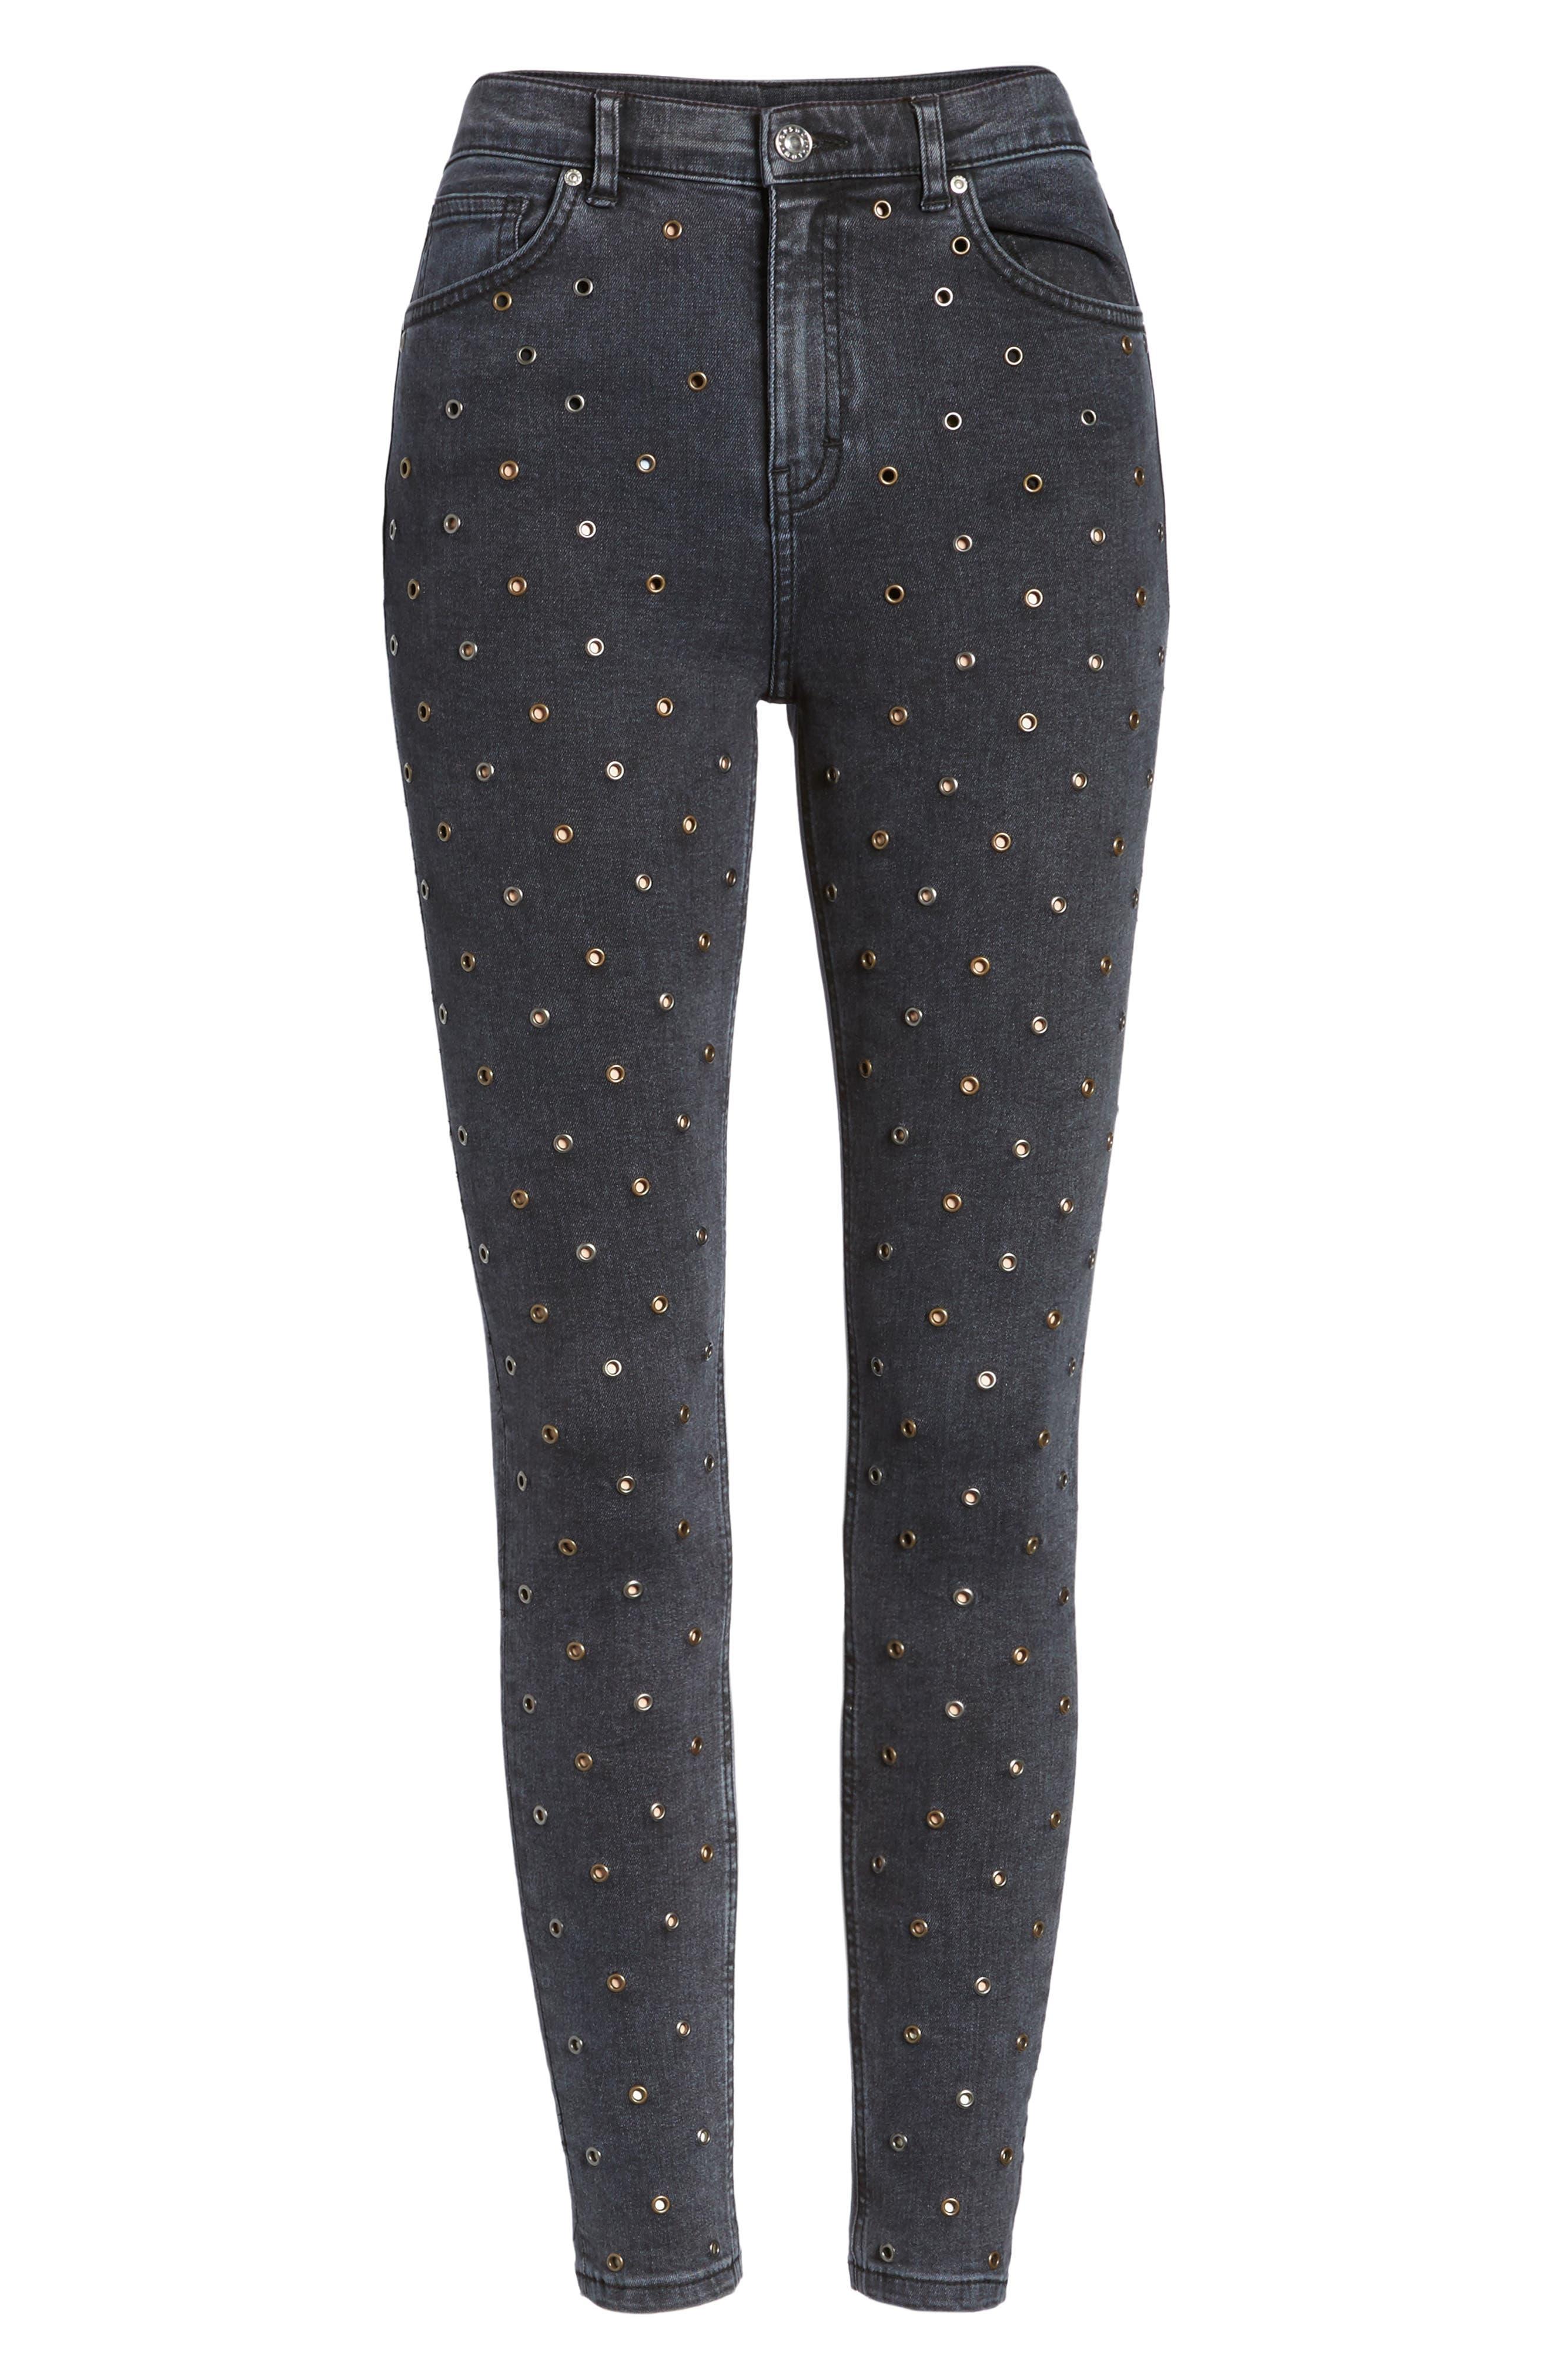 Jamie Grommet Ankle Skinny Jeans,                             Alternate thumbnail 7, color,                             Washed Black